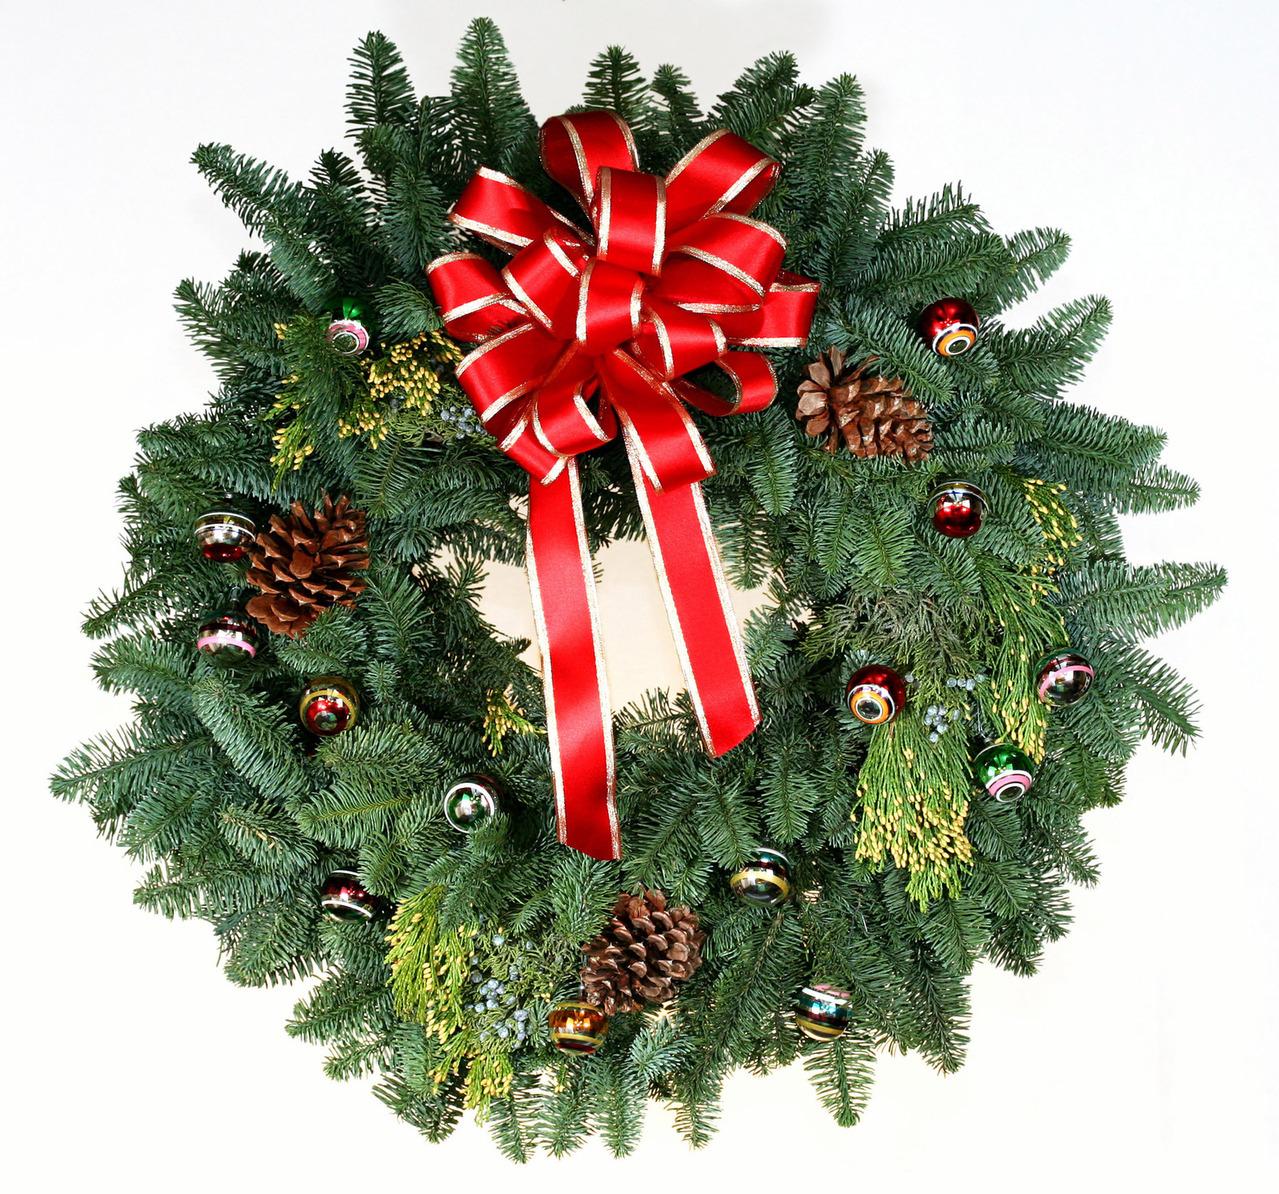 wreath-1199052-1279x1194